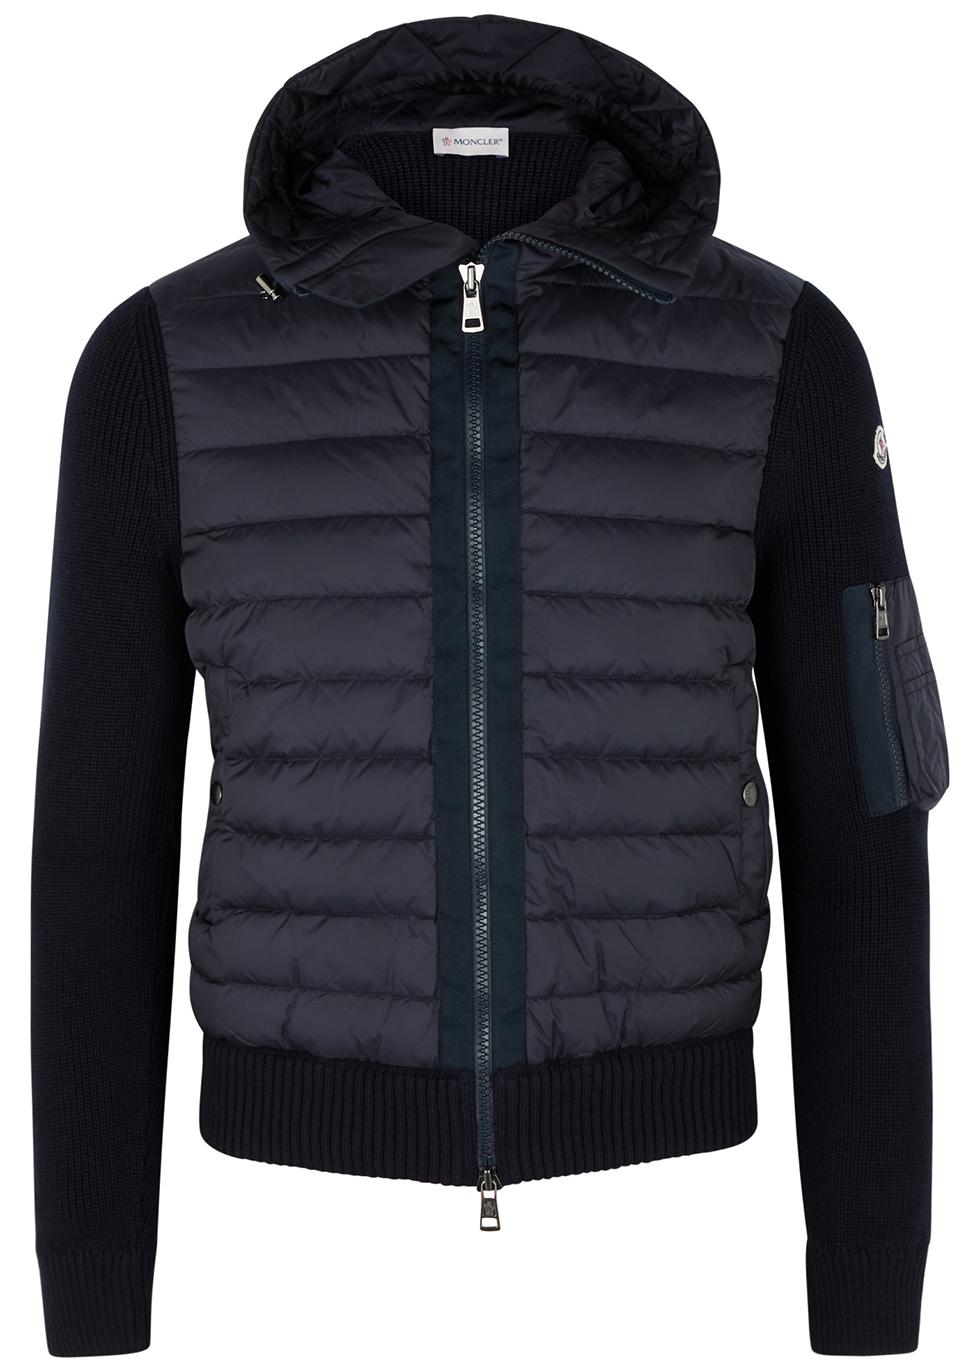 Moncler Designer Jackets, Coats, Gilets Harvey Nichols